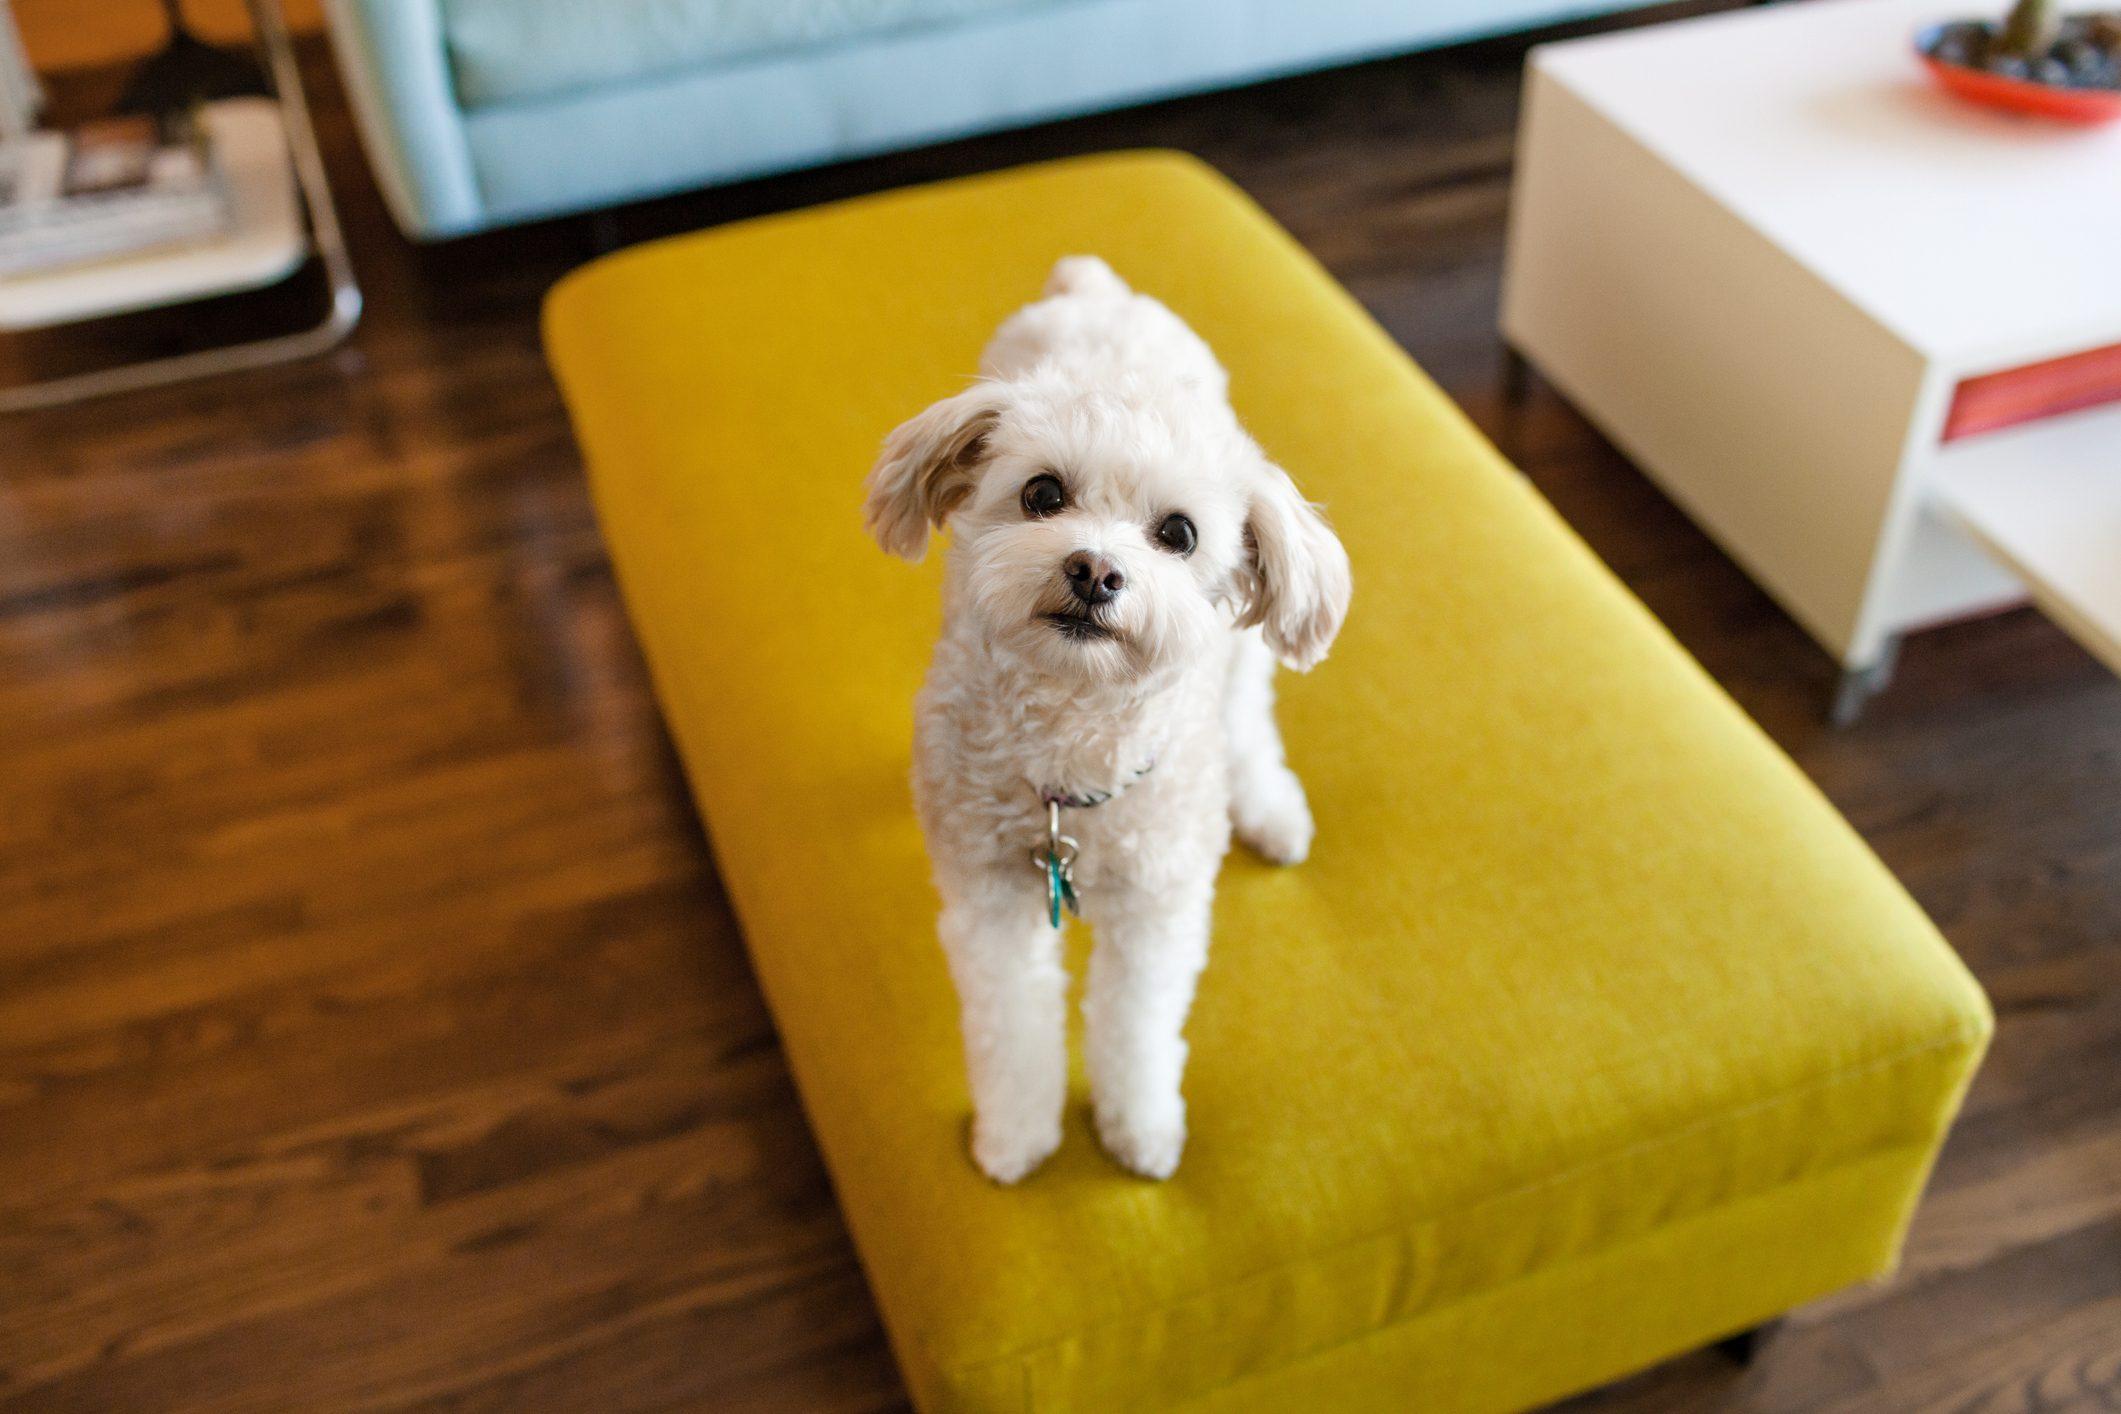 Portrait of dog sitting on stool